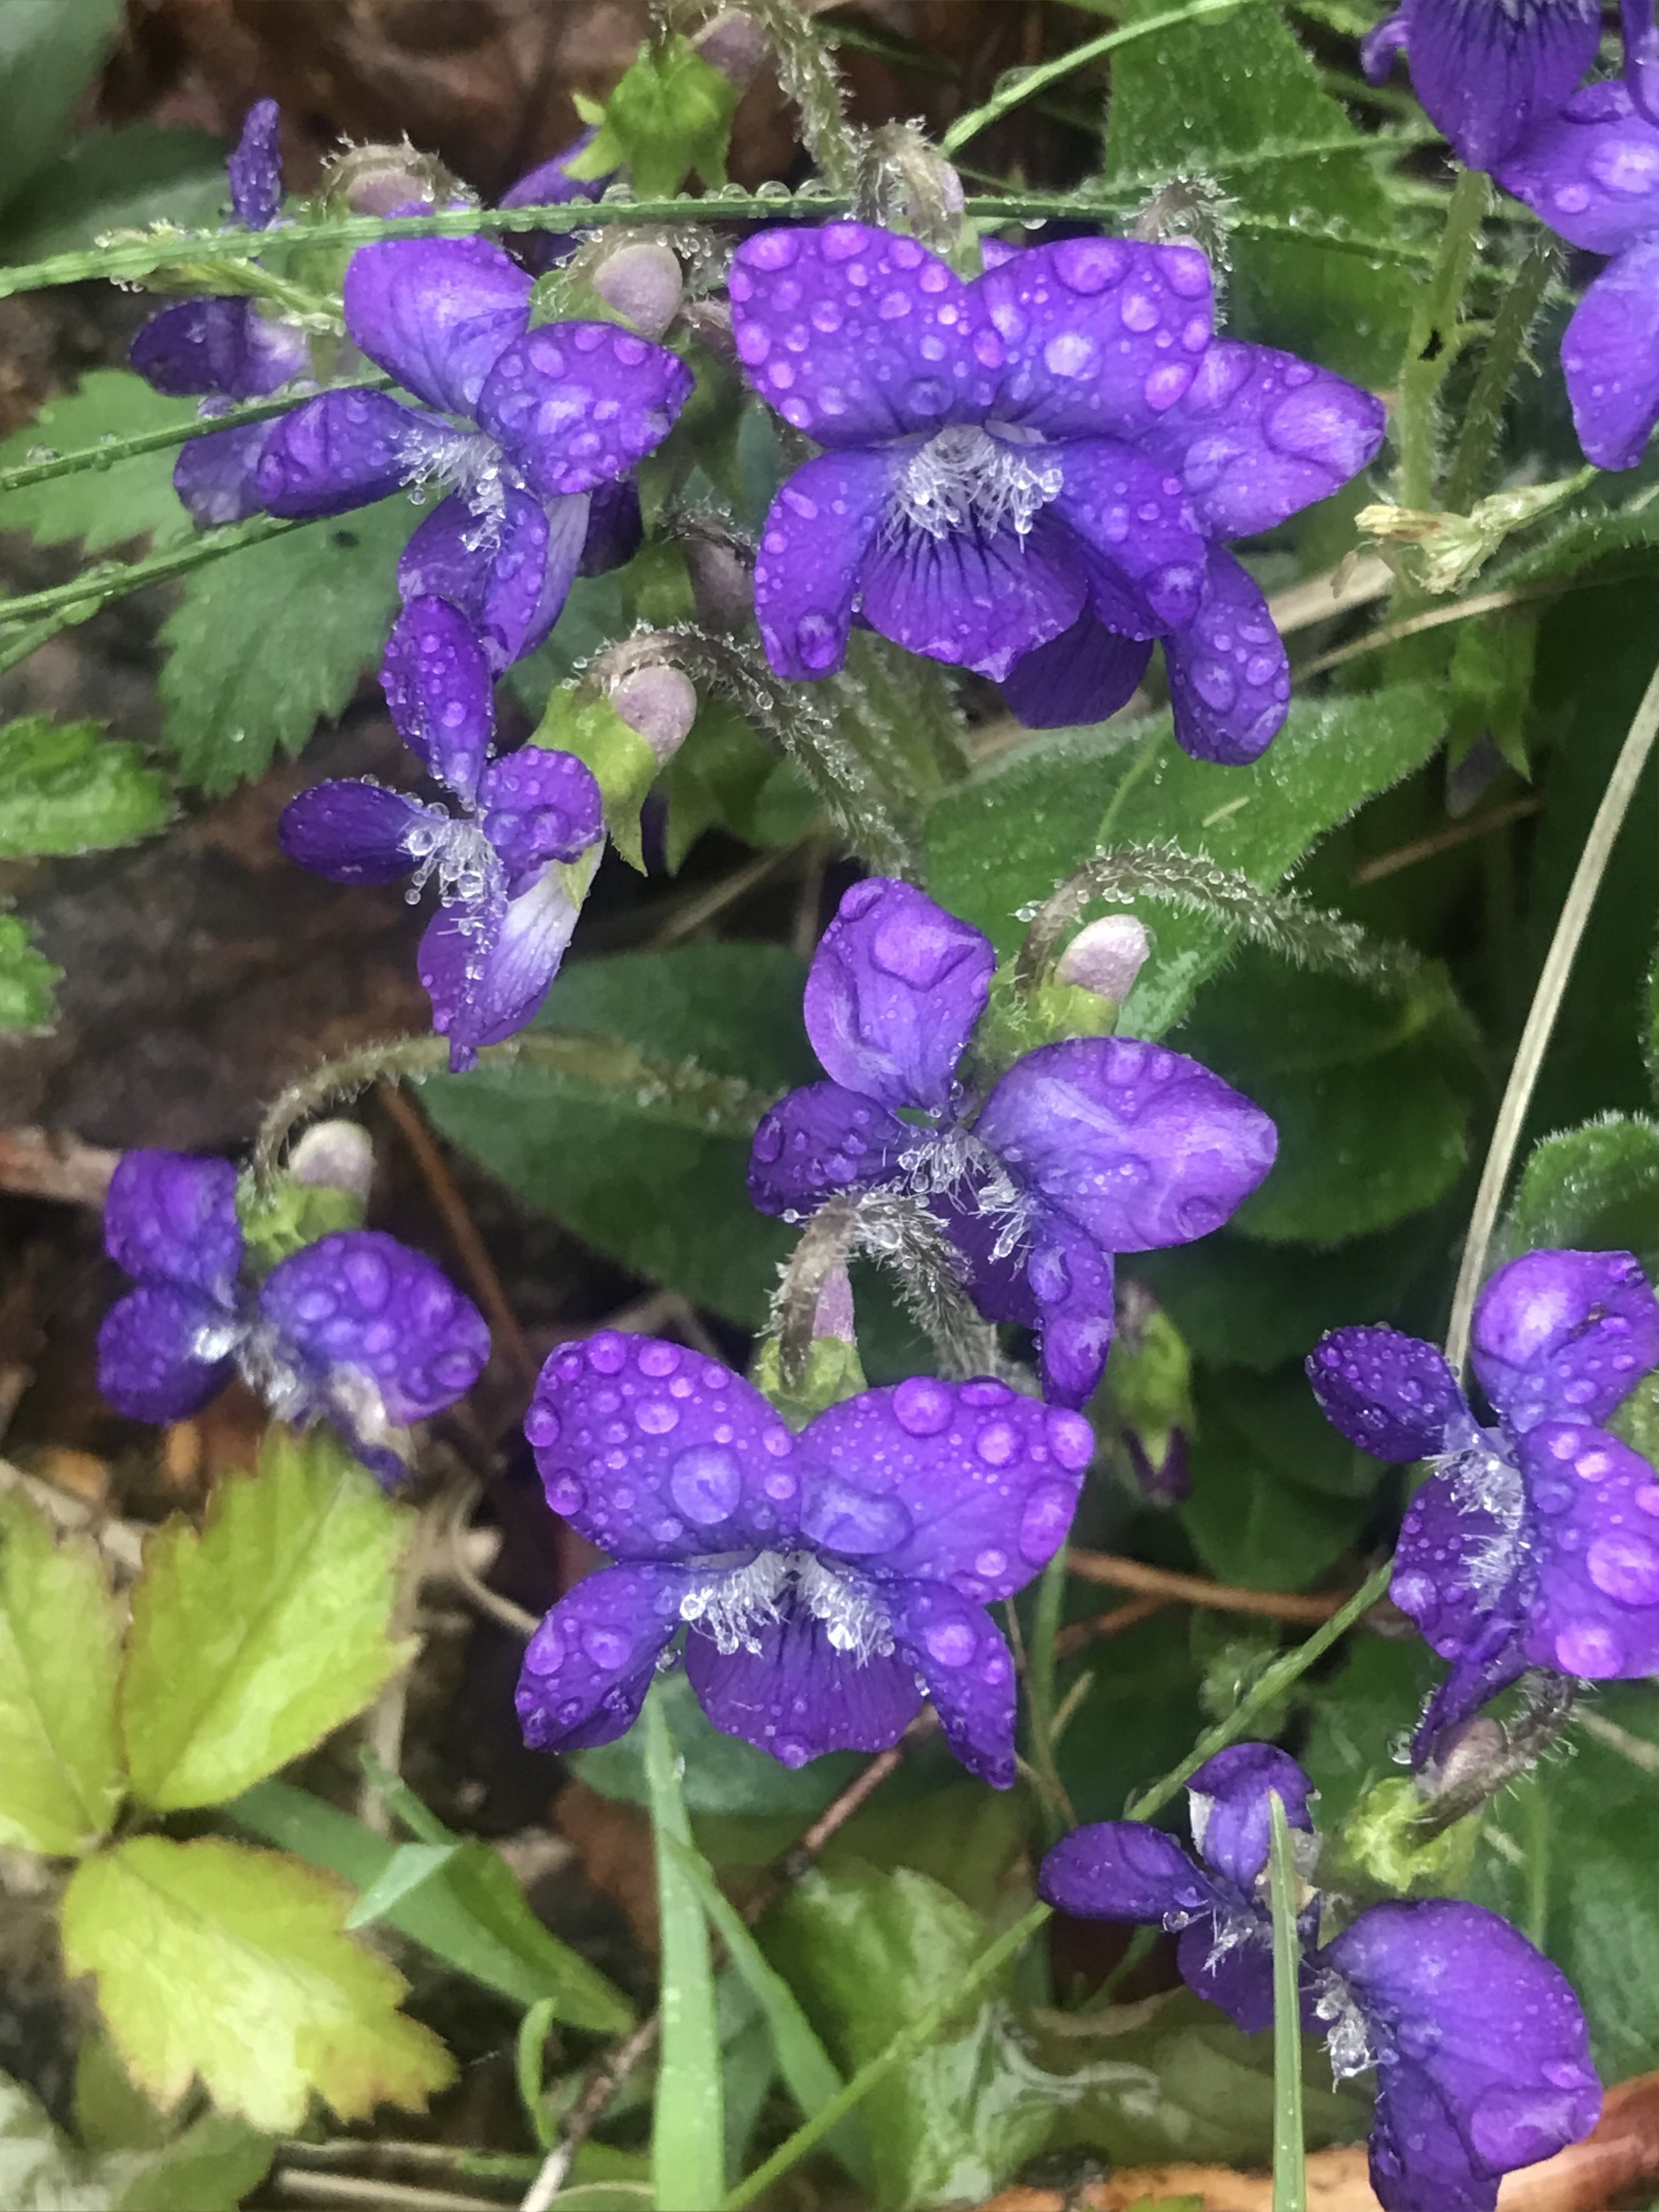 Rainy Woodland Violets